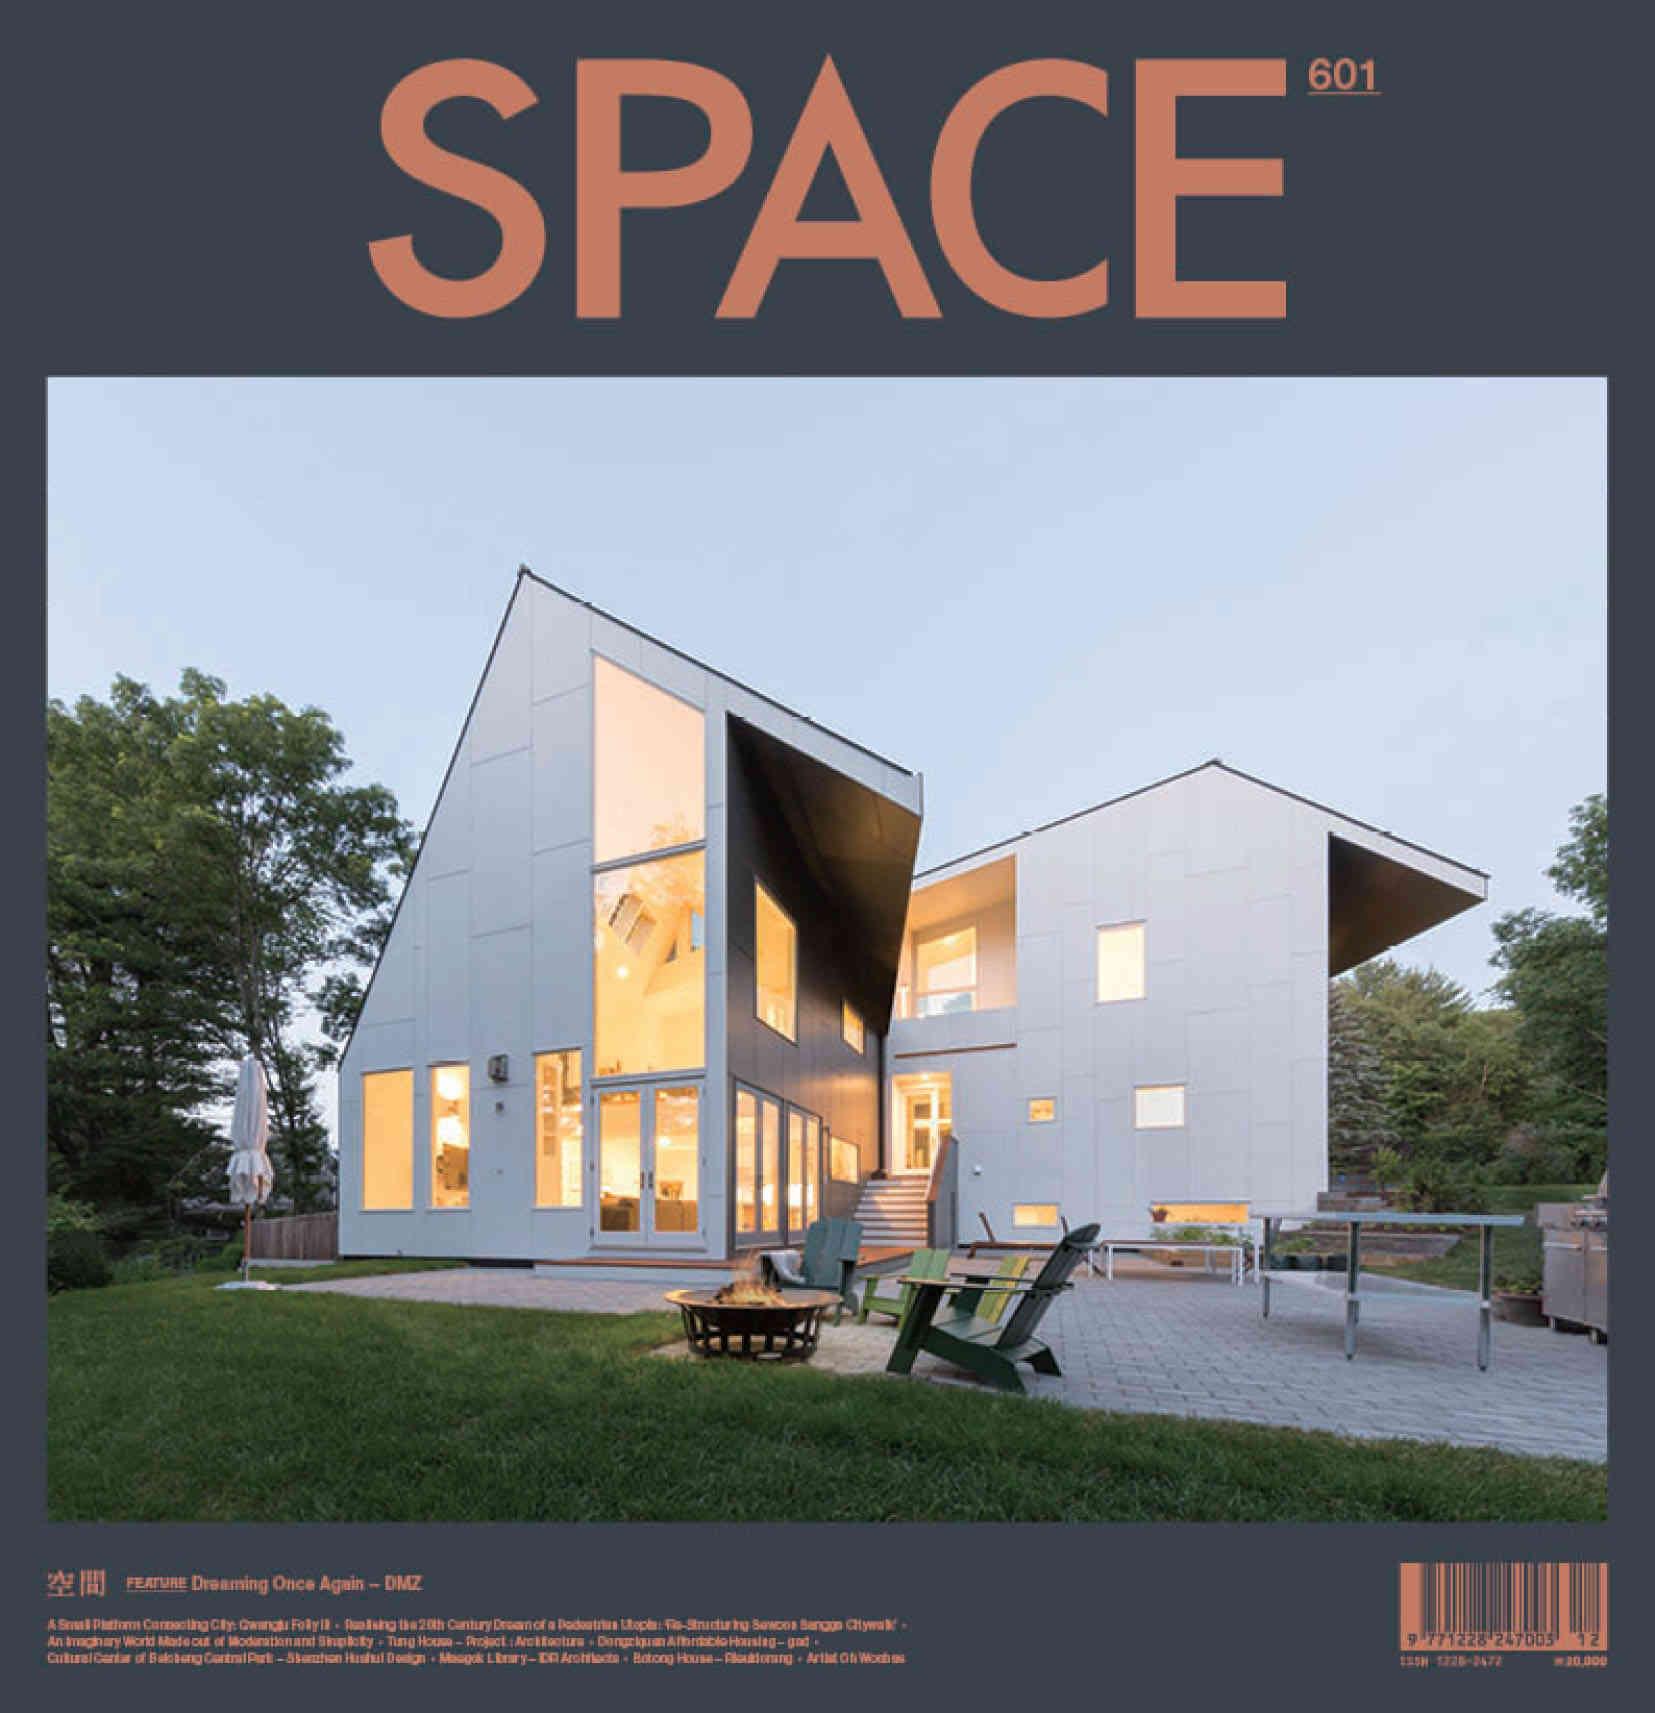 SPACE_1712_RT_세운상가_pdf-1.jpg